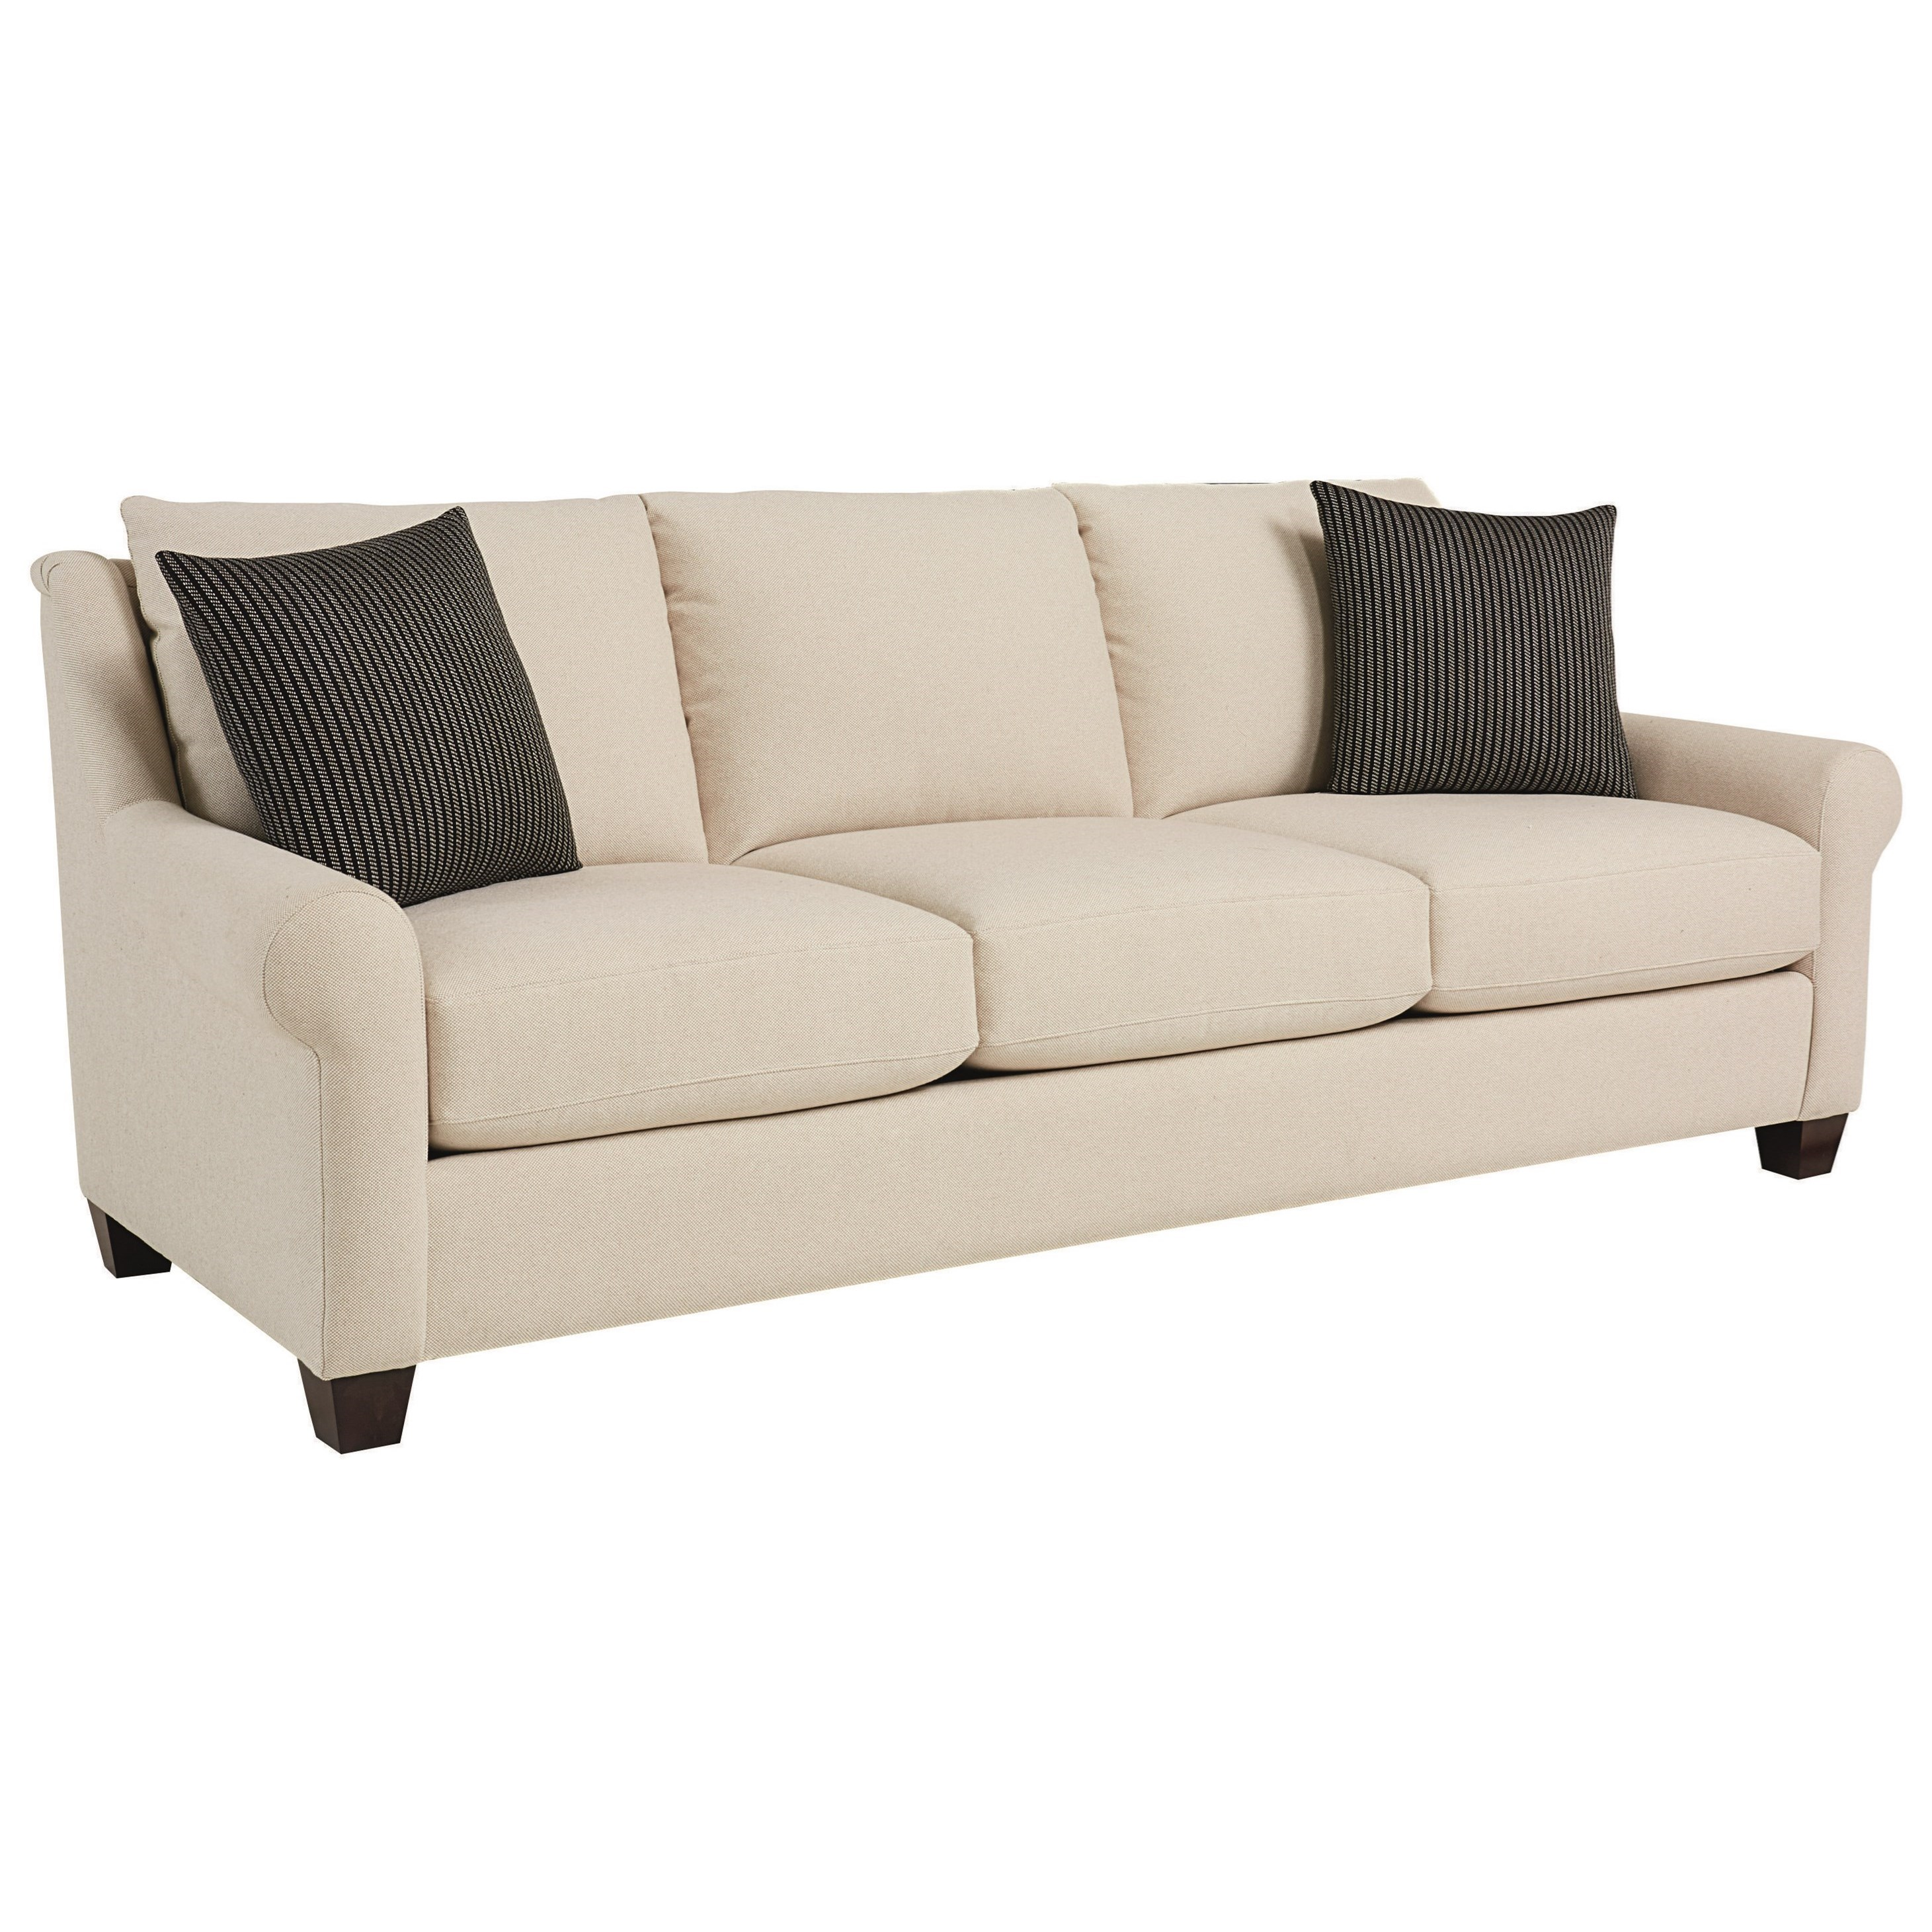 "Ellery 93"" Great Room Sofa by Bassett at Bassett of Cool Springs"